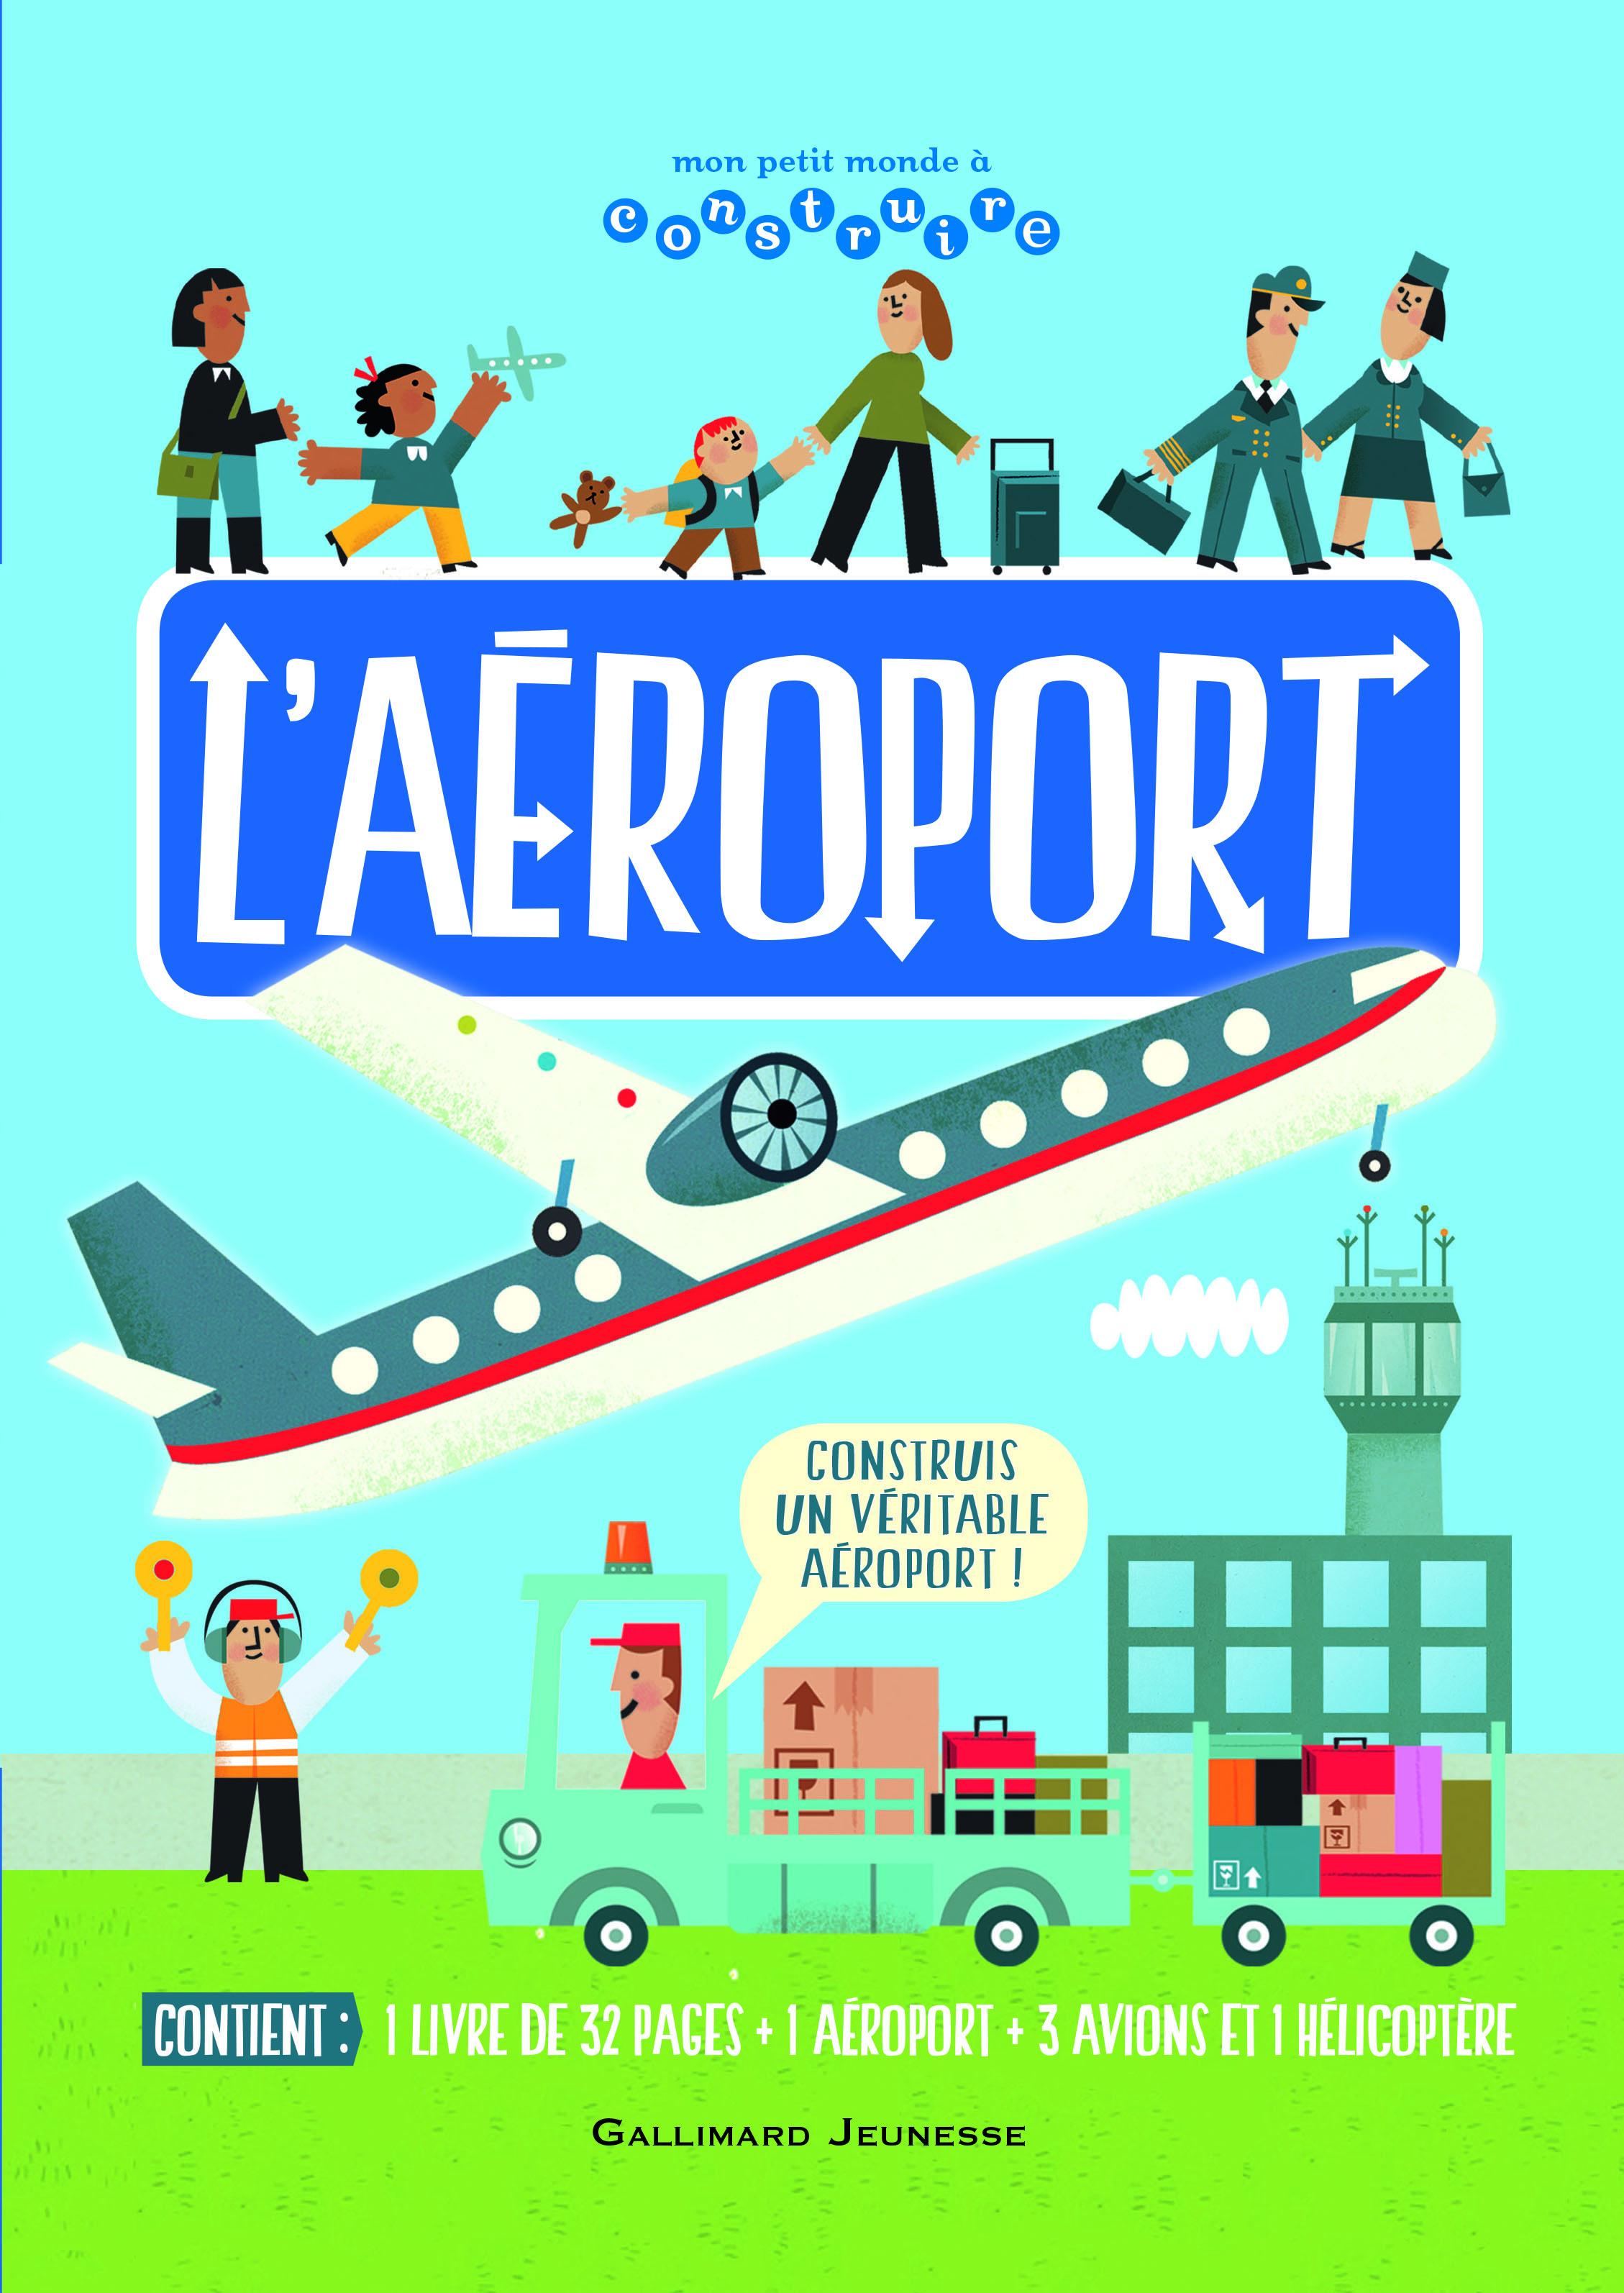 L'AEROPORT